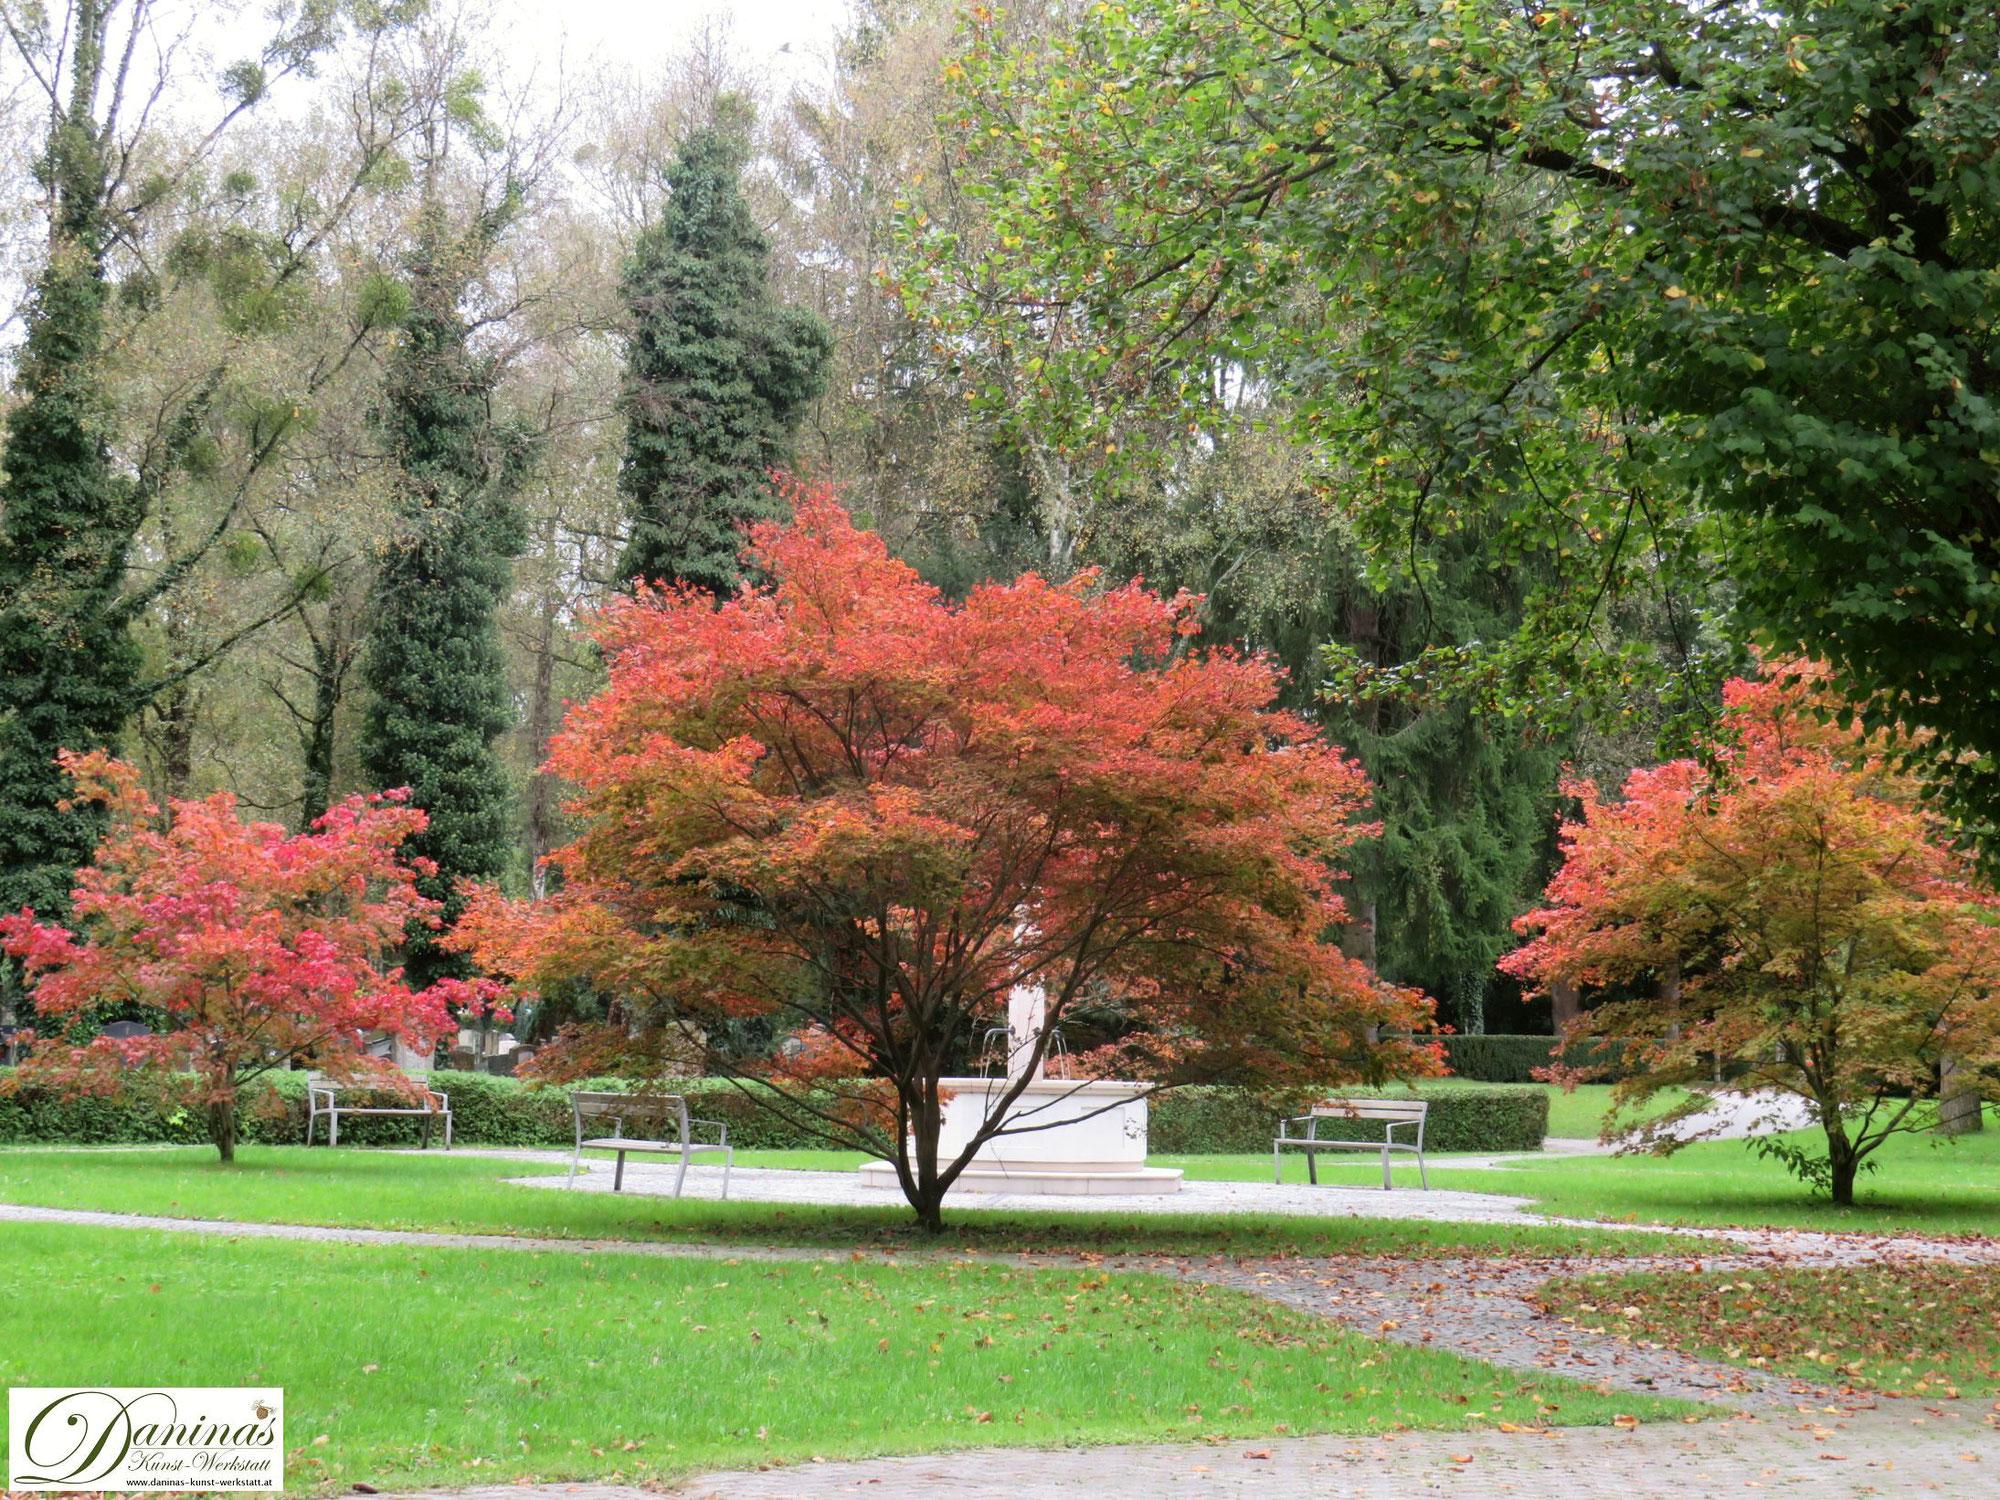 Herbst Bilder gegen Herbst Blues